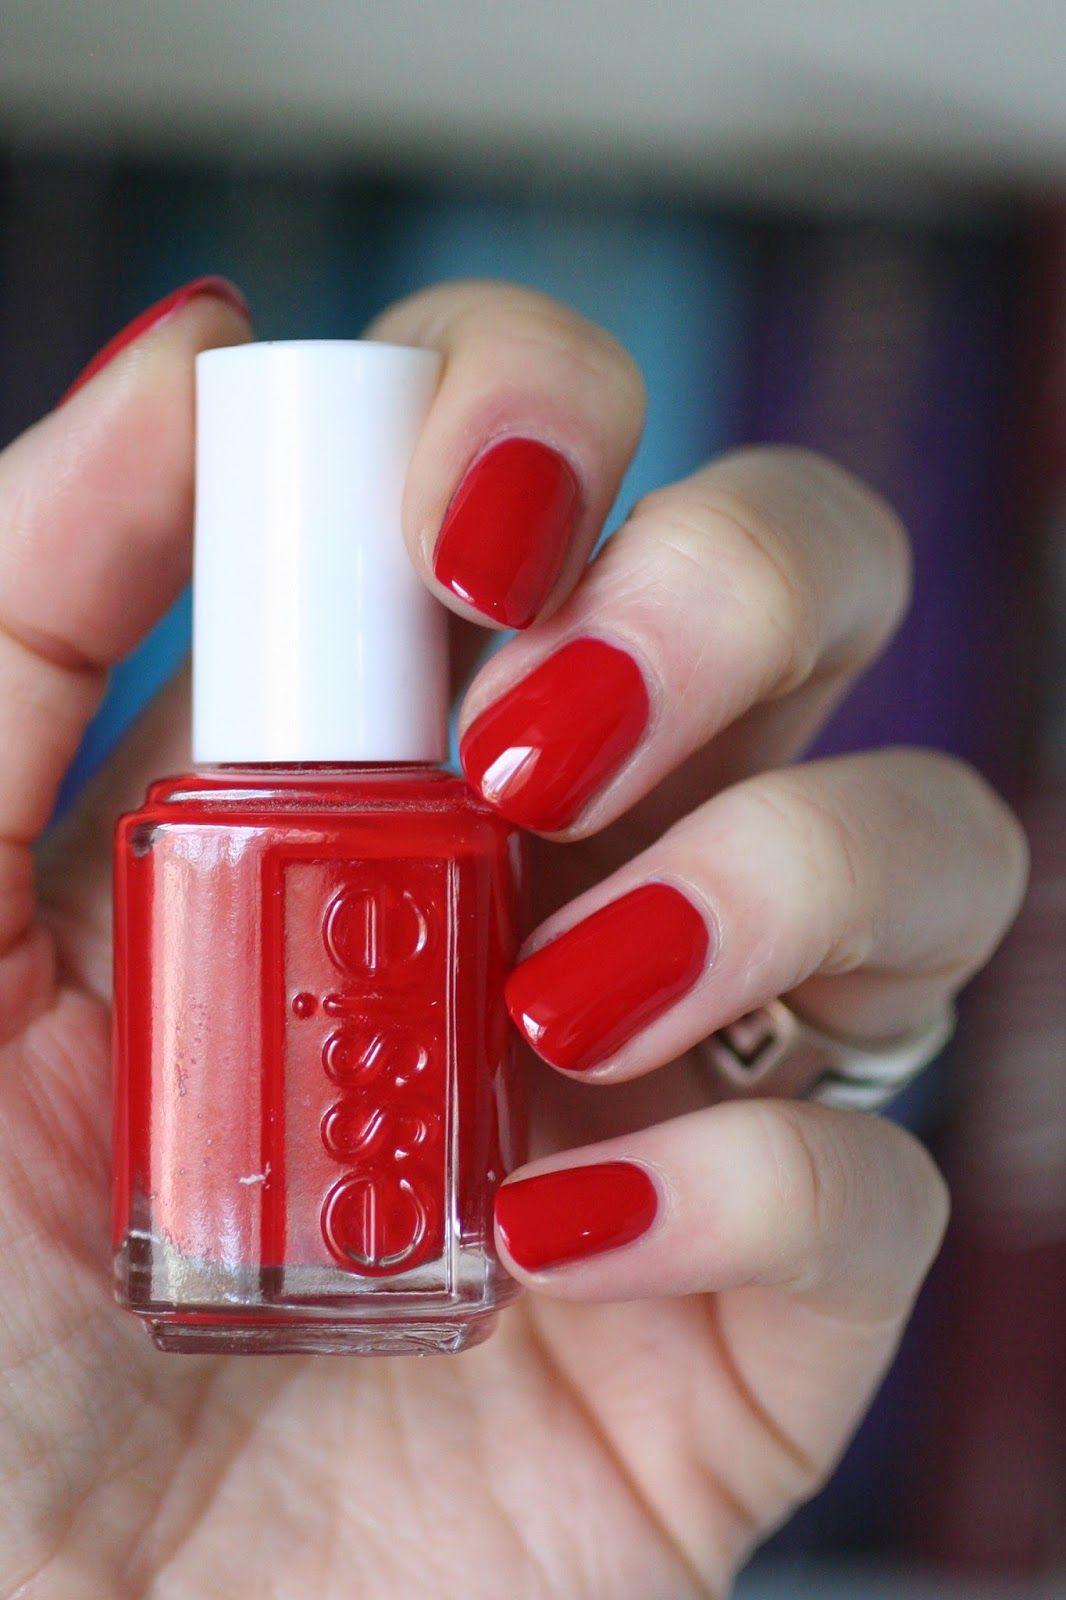 Essie Really Red || Essie Envy | Essie Envy | Pinterest | Envy ...